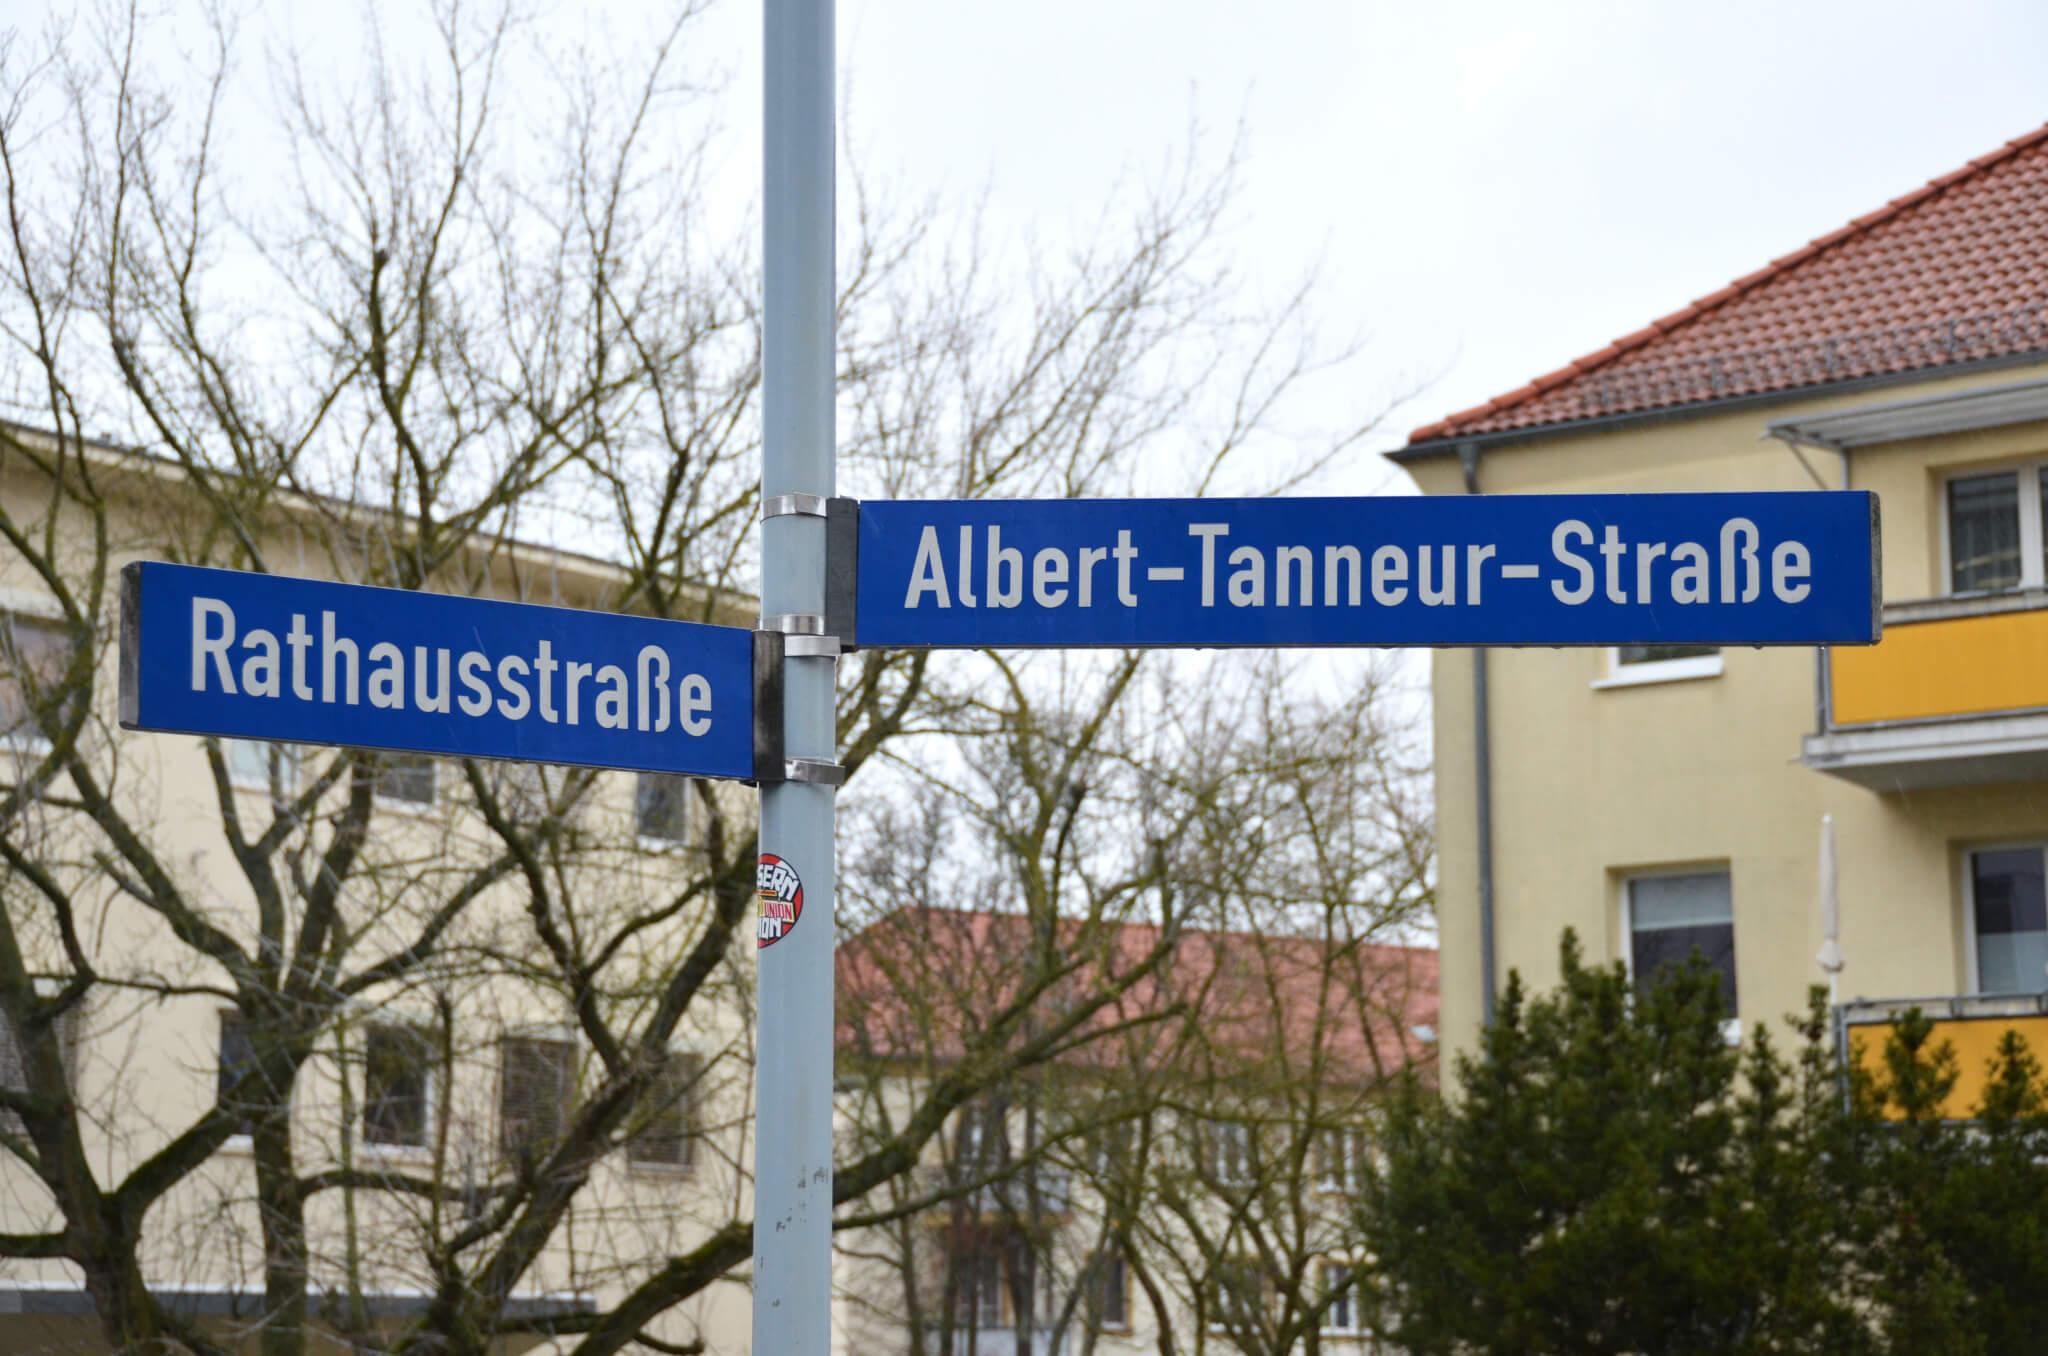 rathausstraße-tanneurstraße